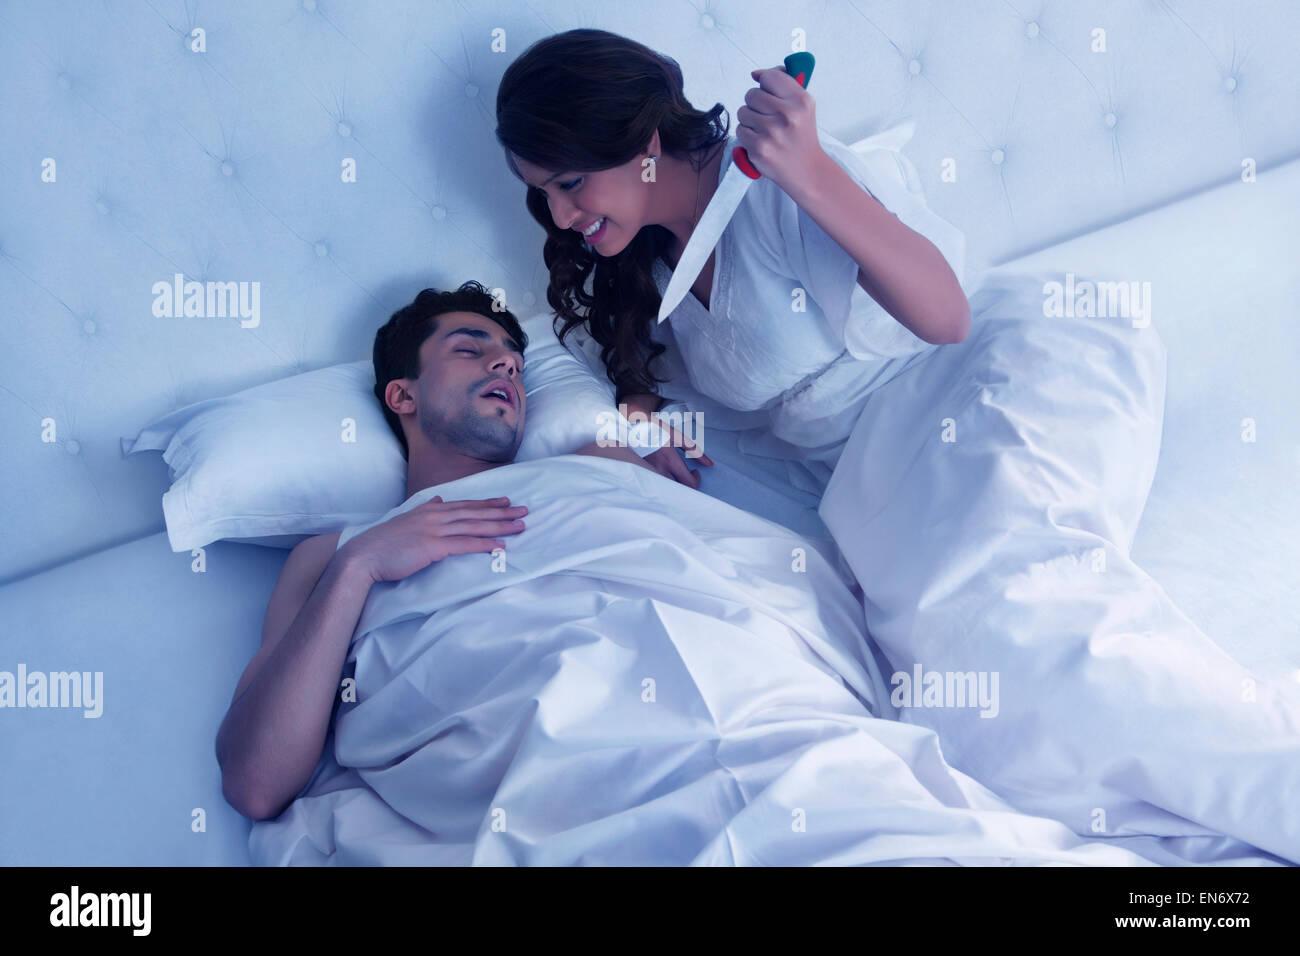 Трахнул подругу жены пока та спала, Муж ебет замужнюю подругу жены пока та спит 13 фотография